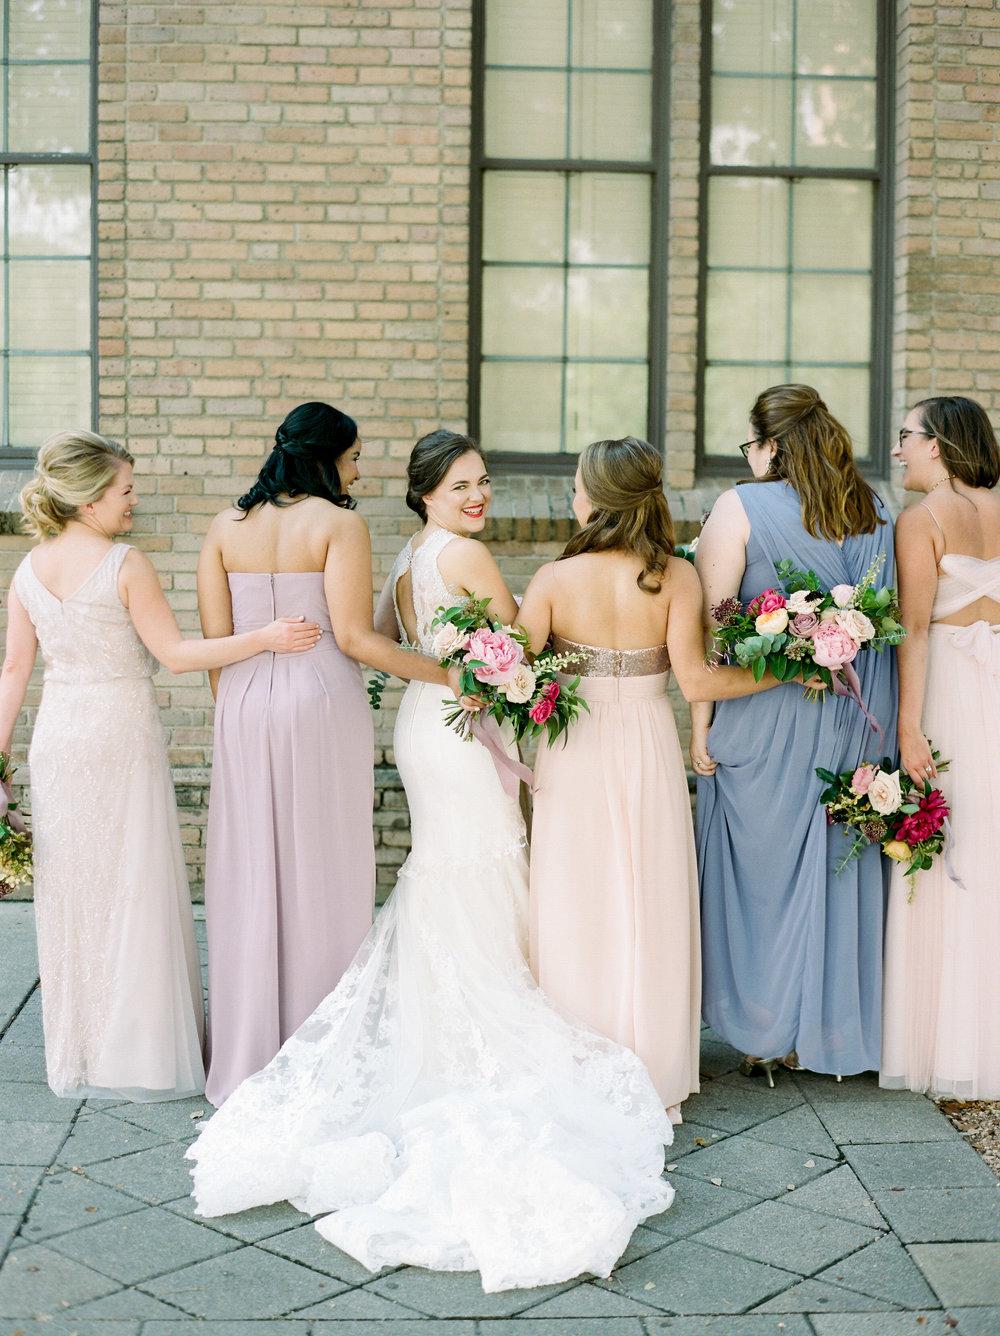 The-Knot-Texas-Fine-Art-Wedding-Film-Destination-Photographer-Houston-Austin-Dallas-New-Orleans-Julia-Ideson-Library-Event-Dana-Josh-Fernandez-Photograph-Top-Best-33.jpg